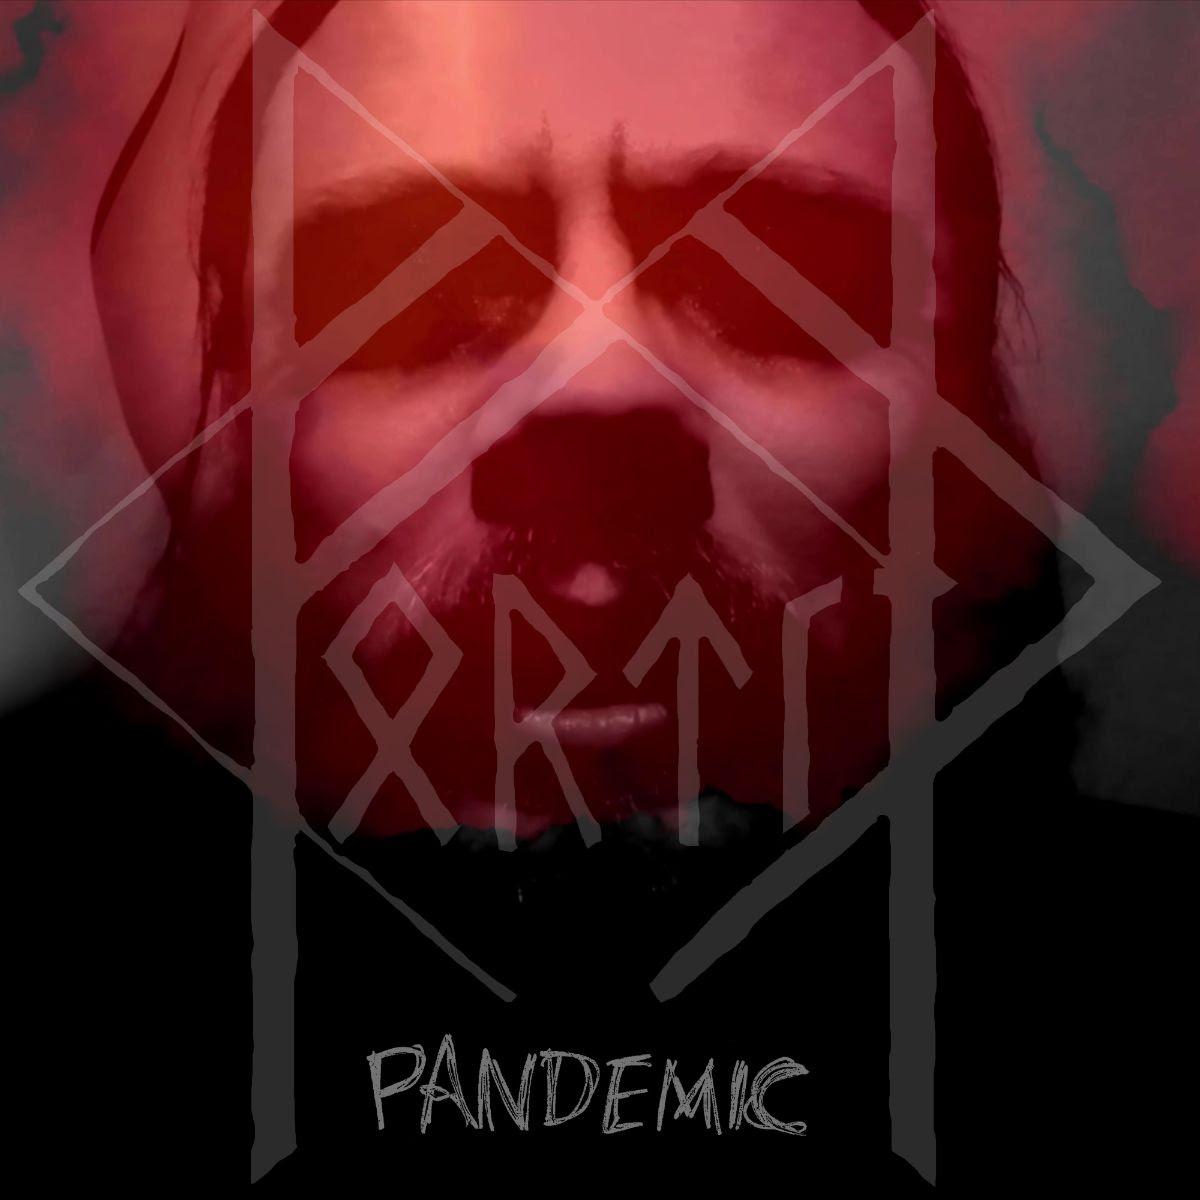 FORTÍРcover 'Pandemic'